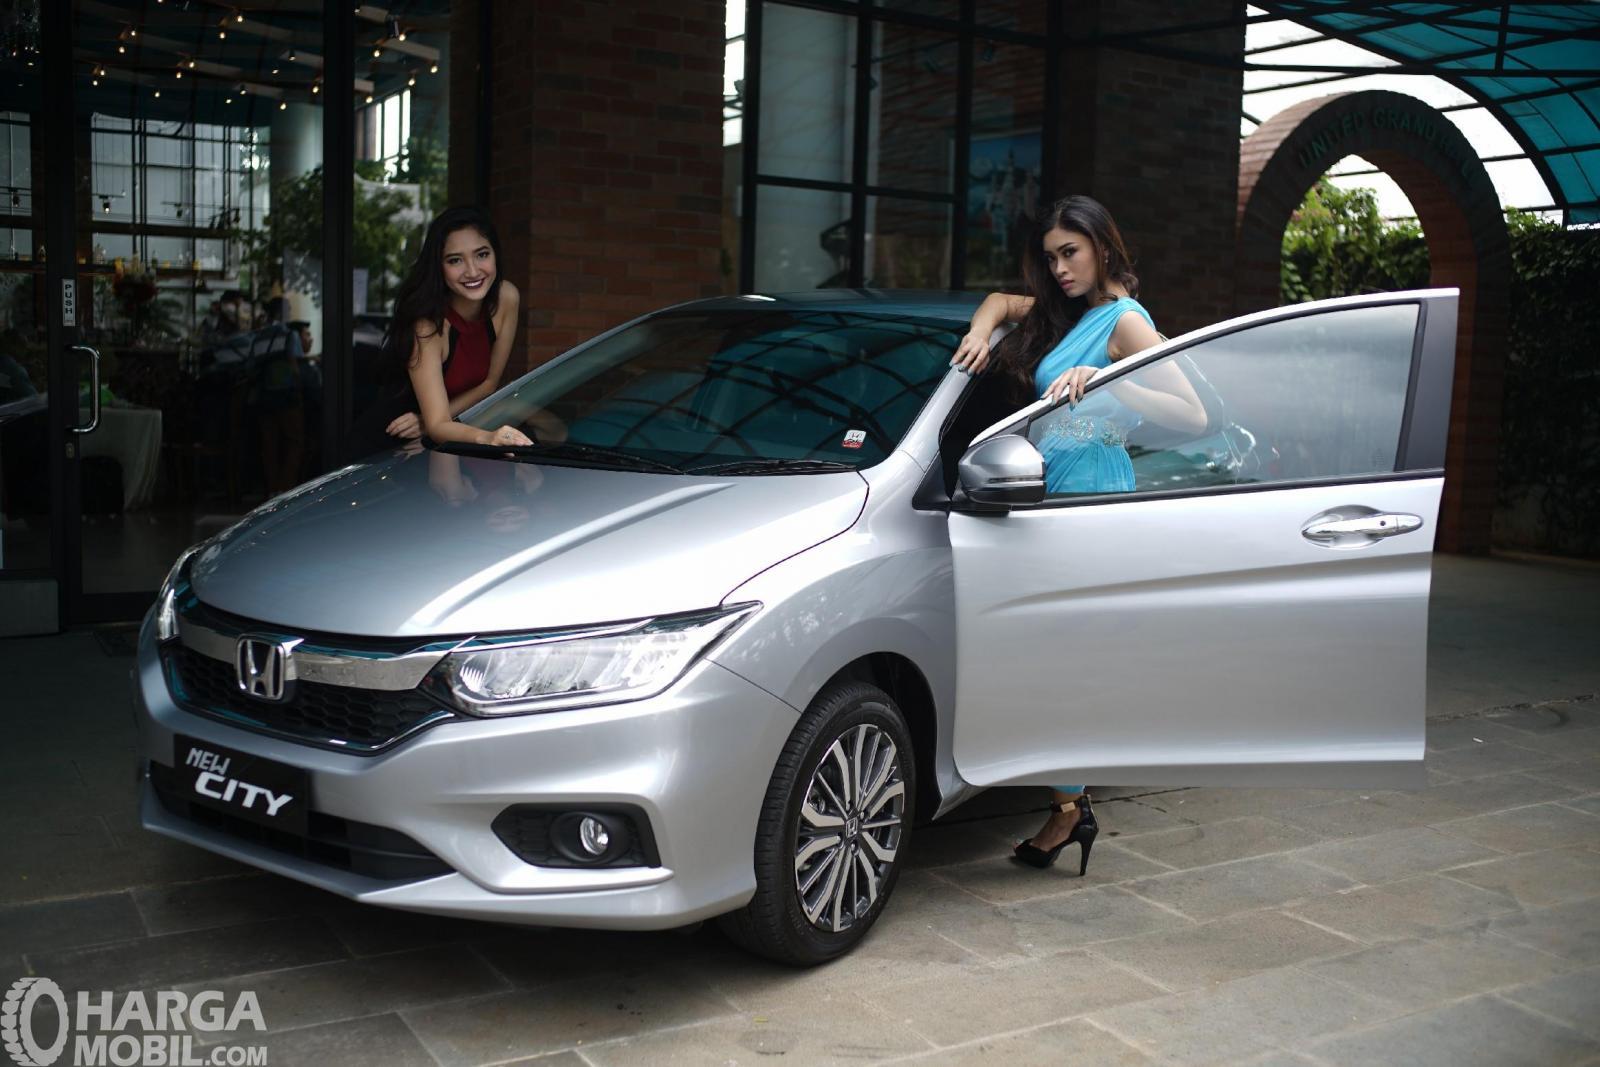 Gambar dua model sedang berdiri di dekat mobil New Honda City